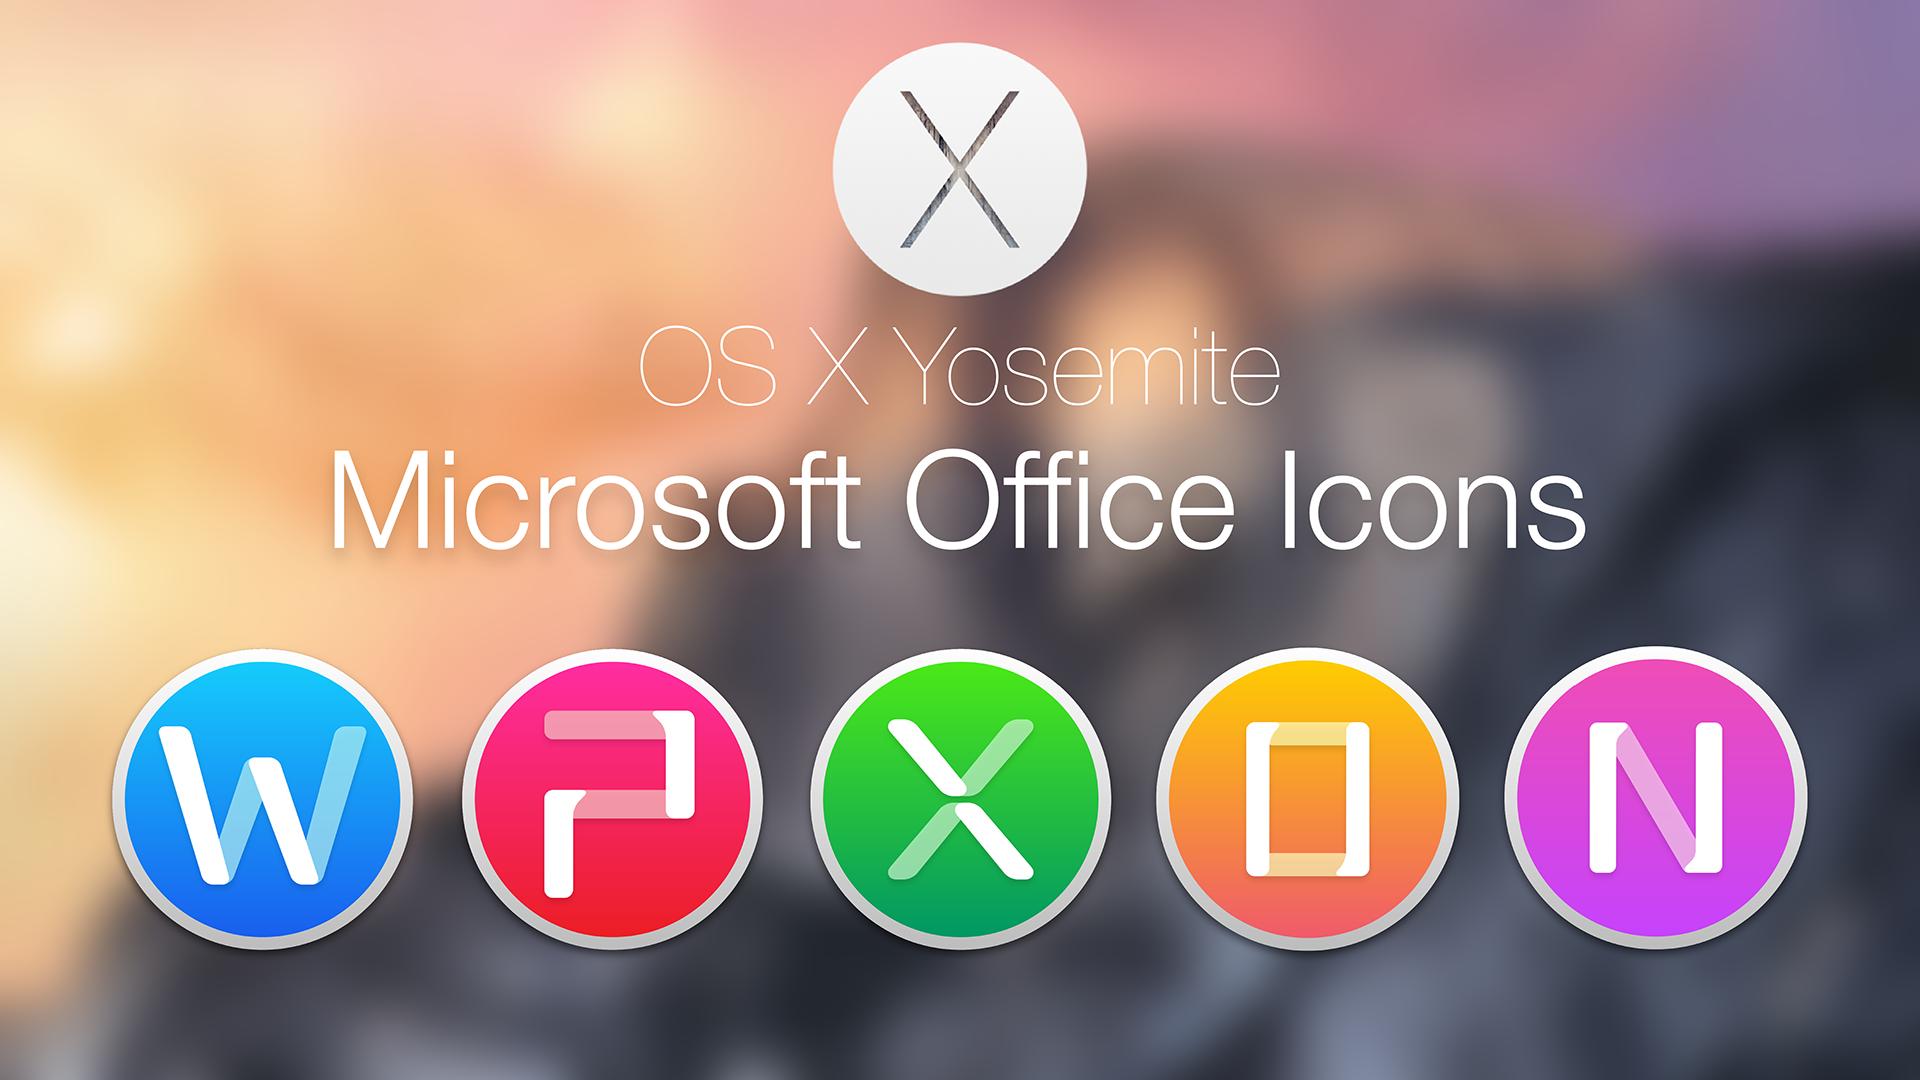 Microsoft Office 2011 Yosemite Style By Hamzasaleem Microsoft Office 2011  Yosemite Style By Hamzasaleem - Microsoft Office PNG HD